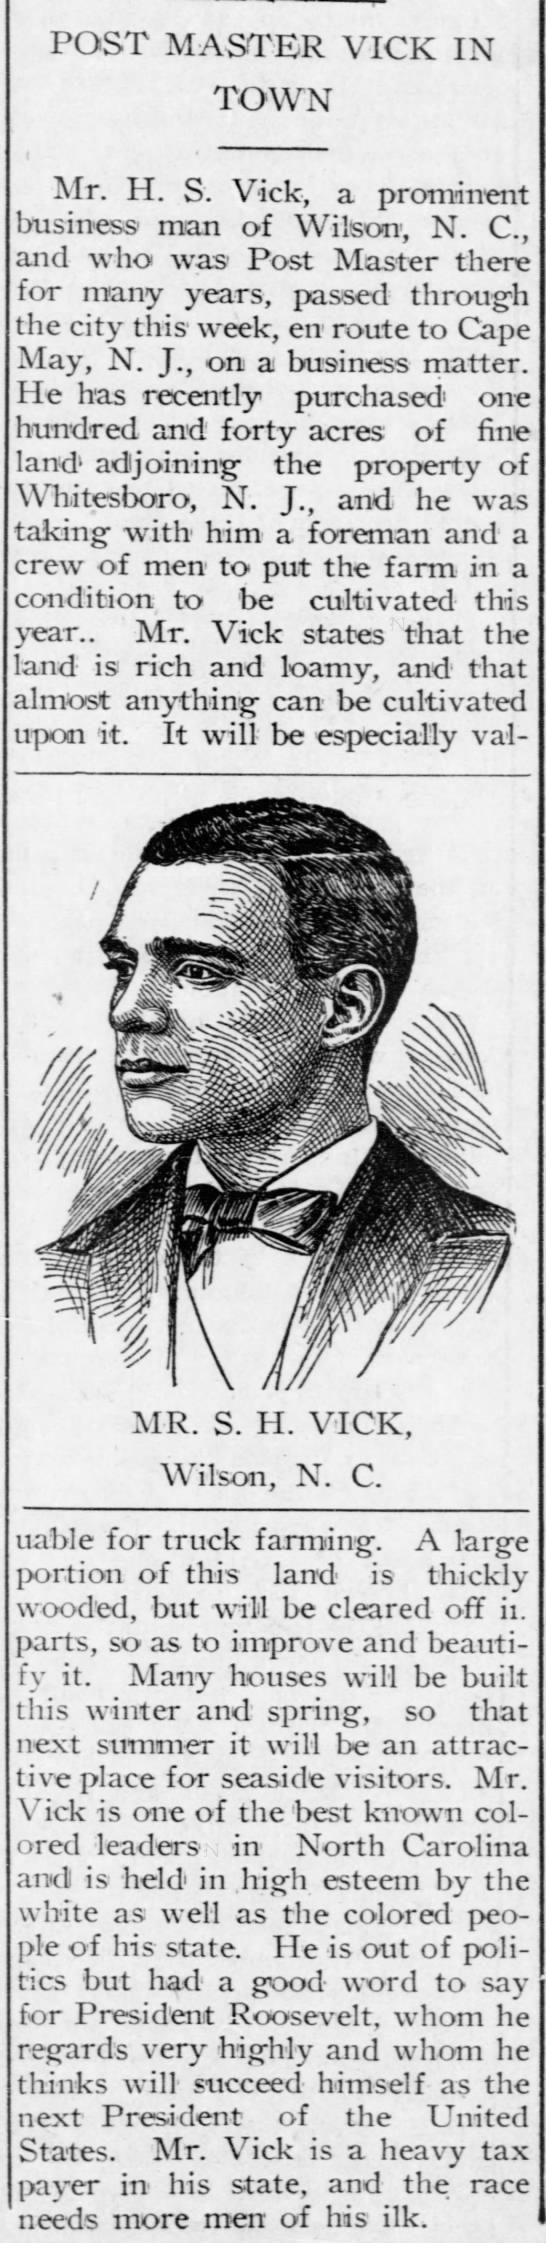 vick-1-9-1904